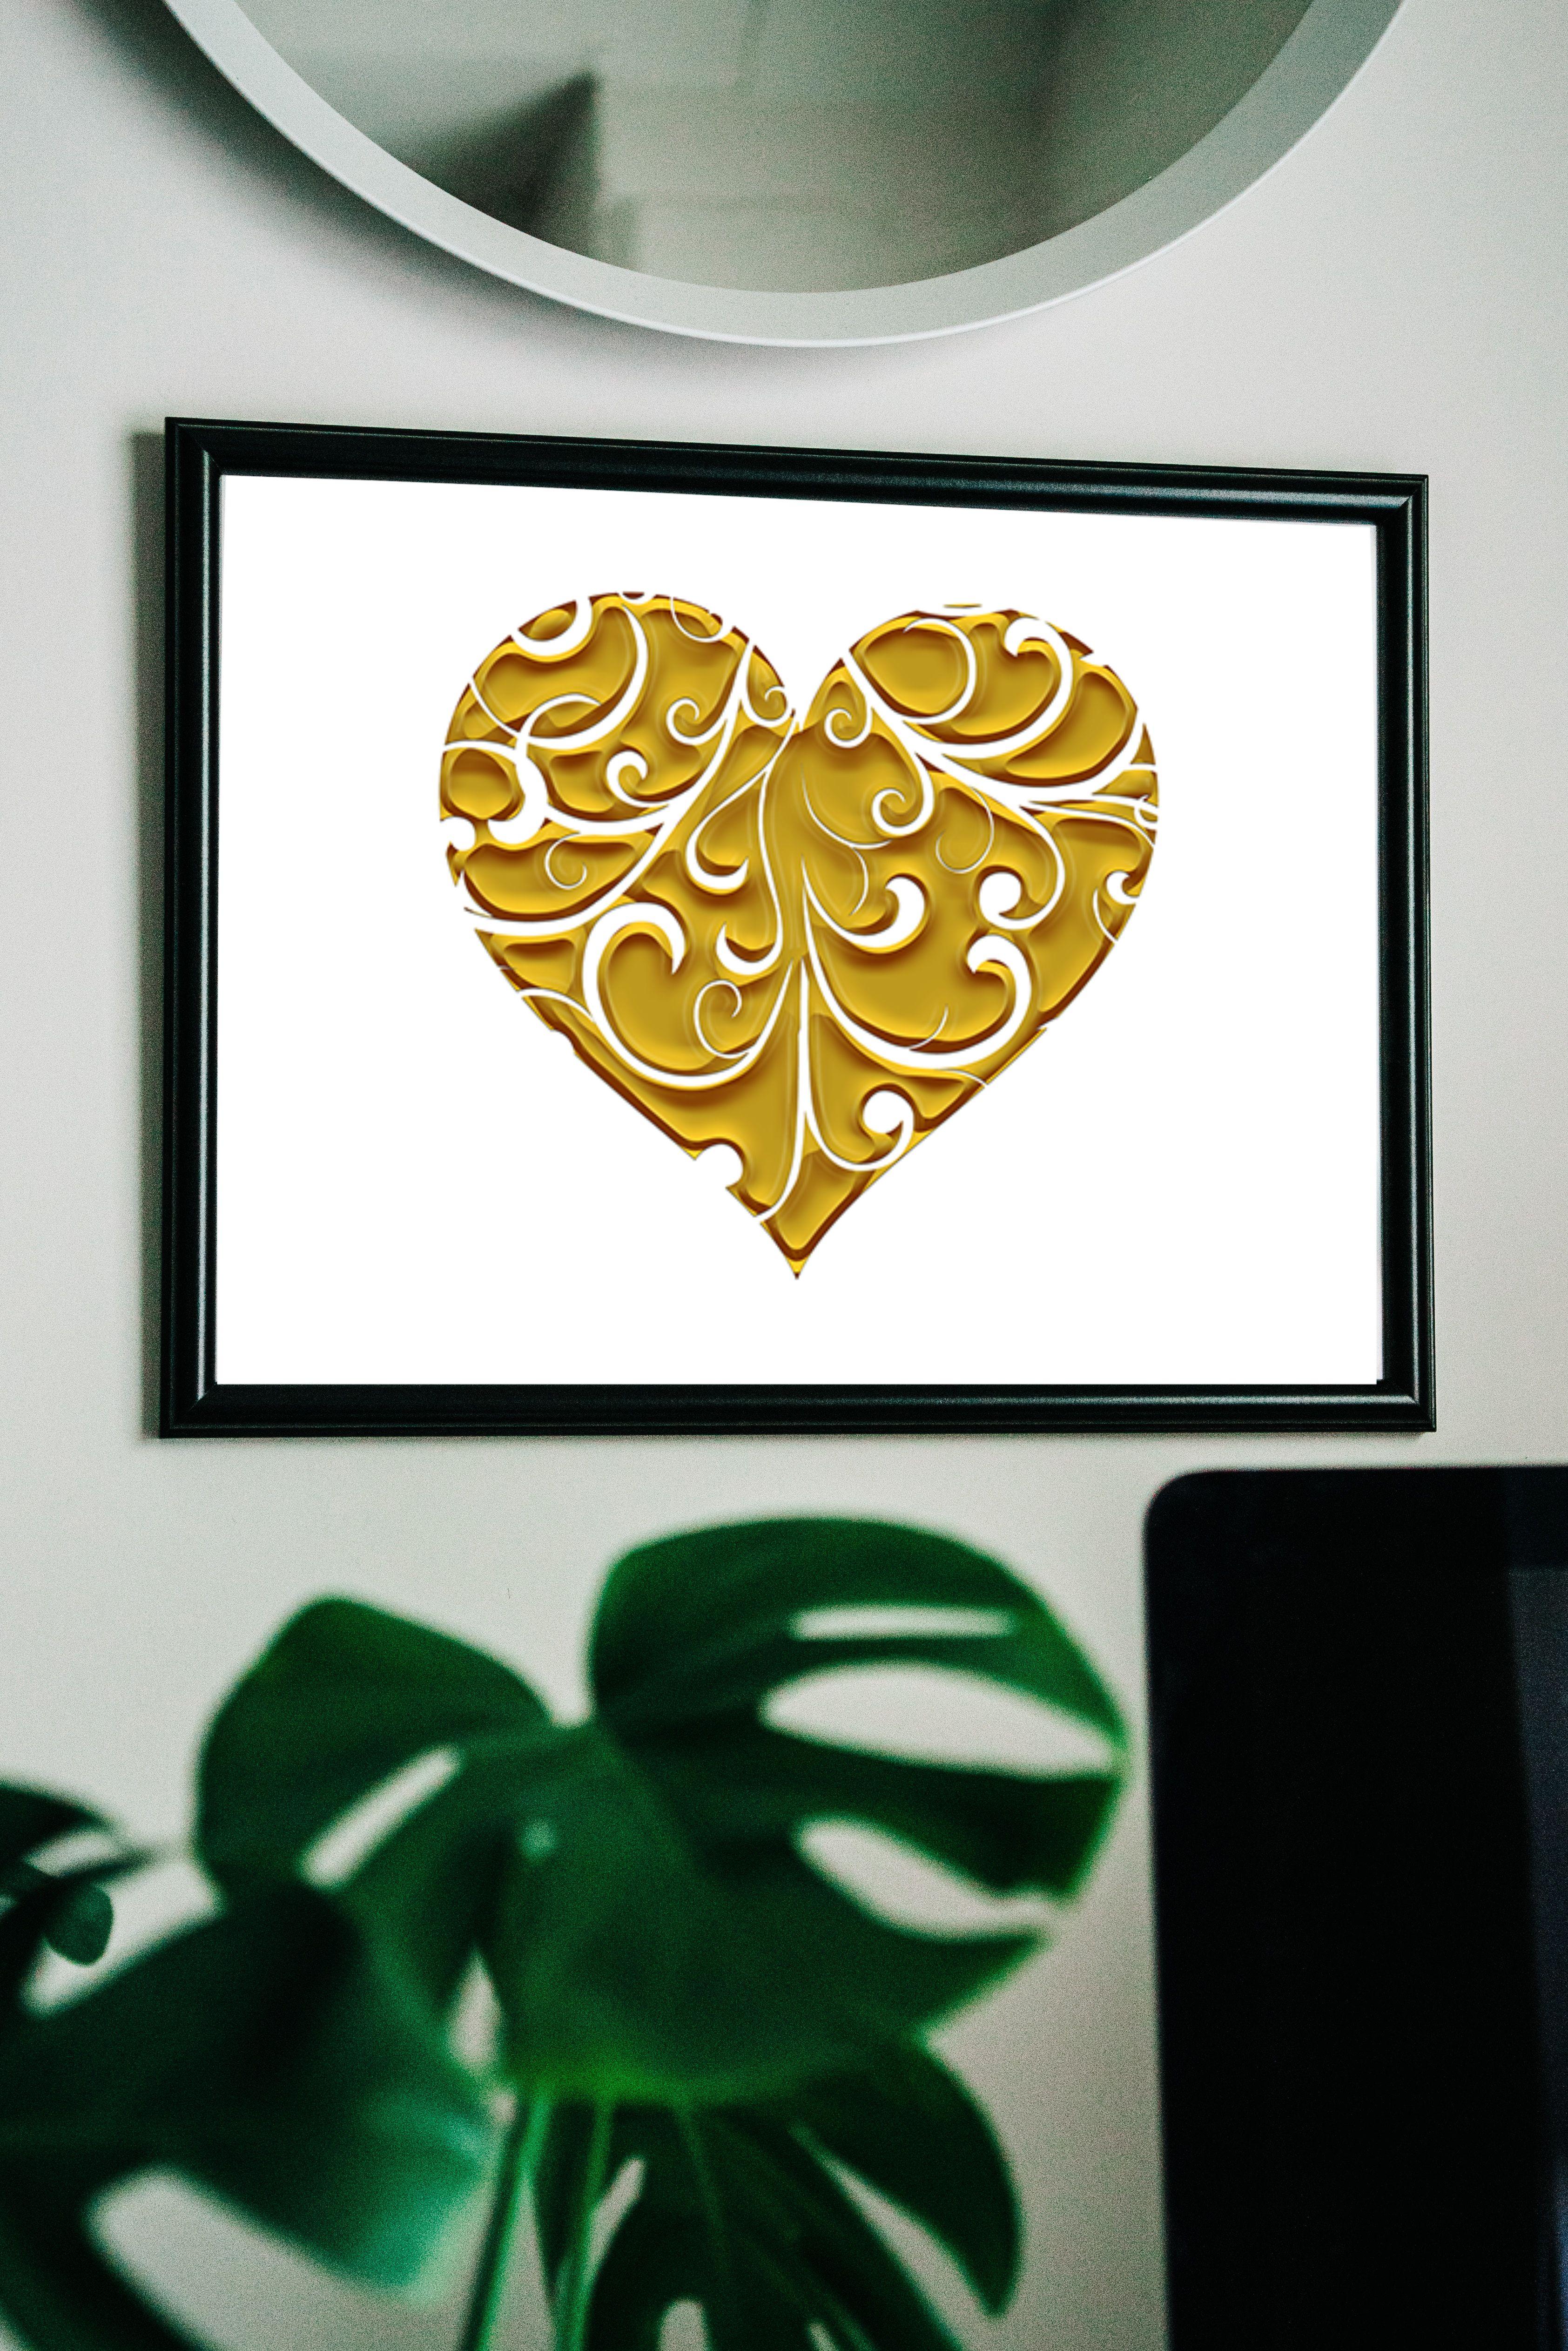 Gold Print Heart Print Artwork Home Decor Downloads Valentines Day Gift Wedding Gift Romantic Art Minimalist Art Ornamental Print Romantic Art Print Minimalist Art